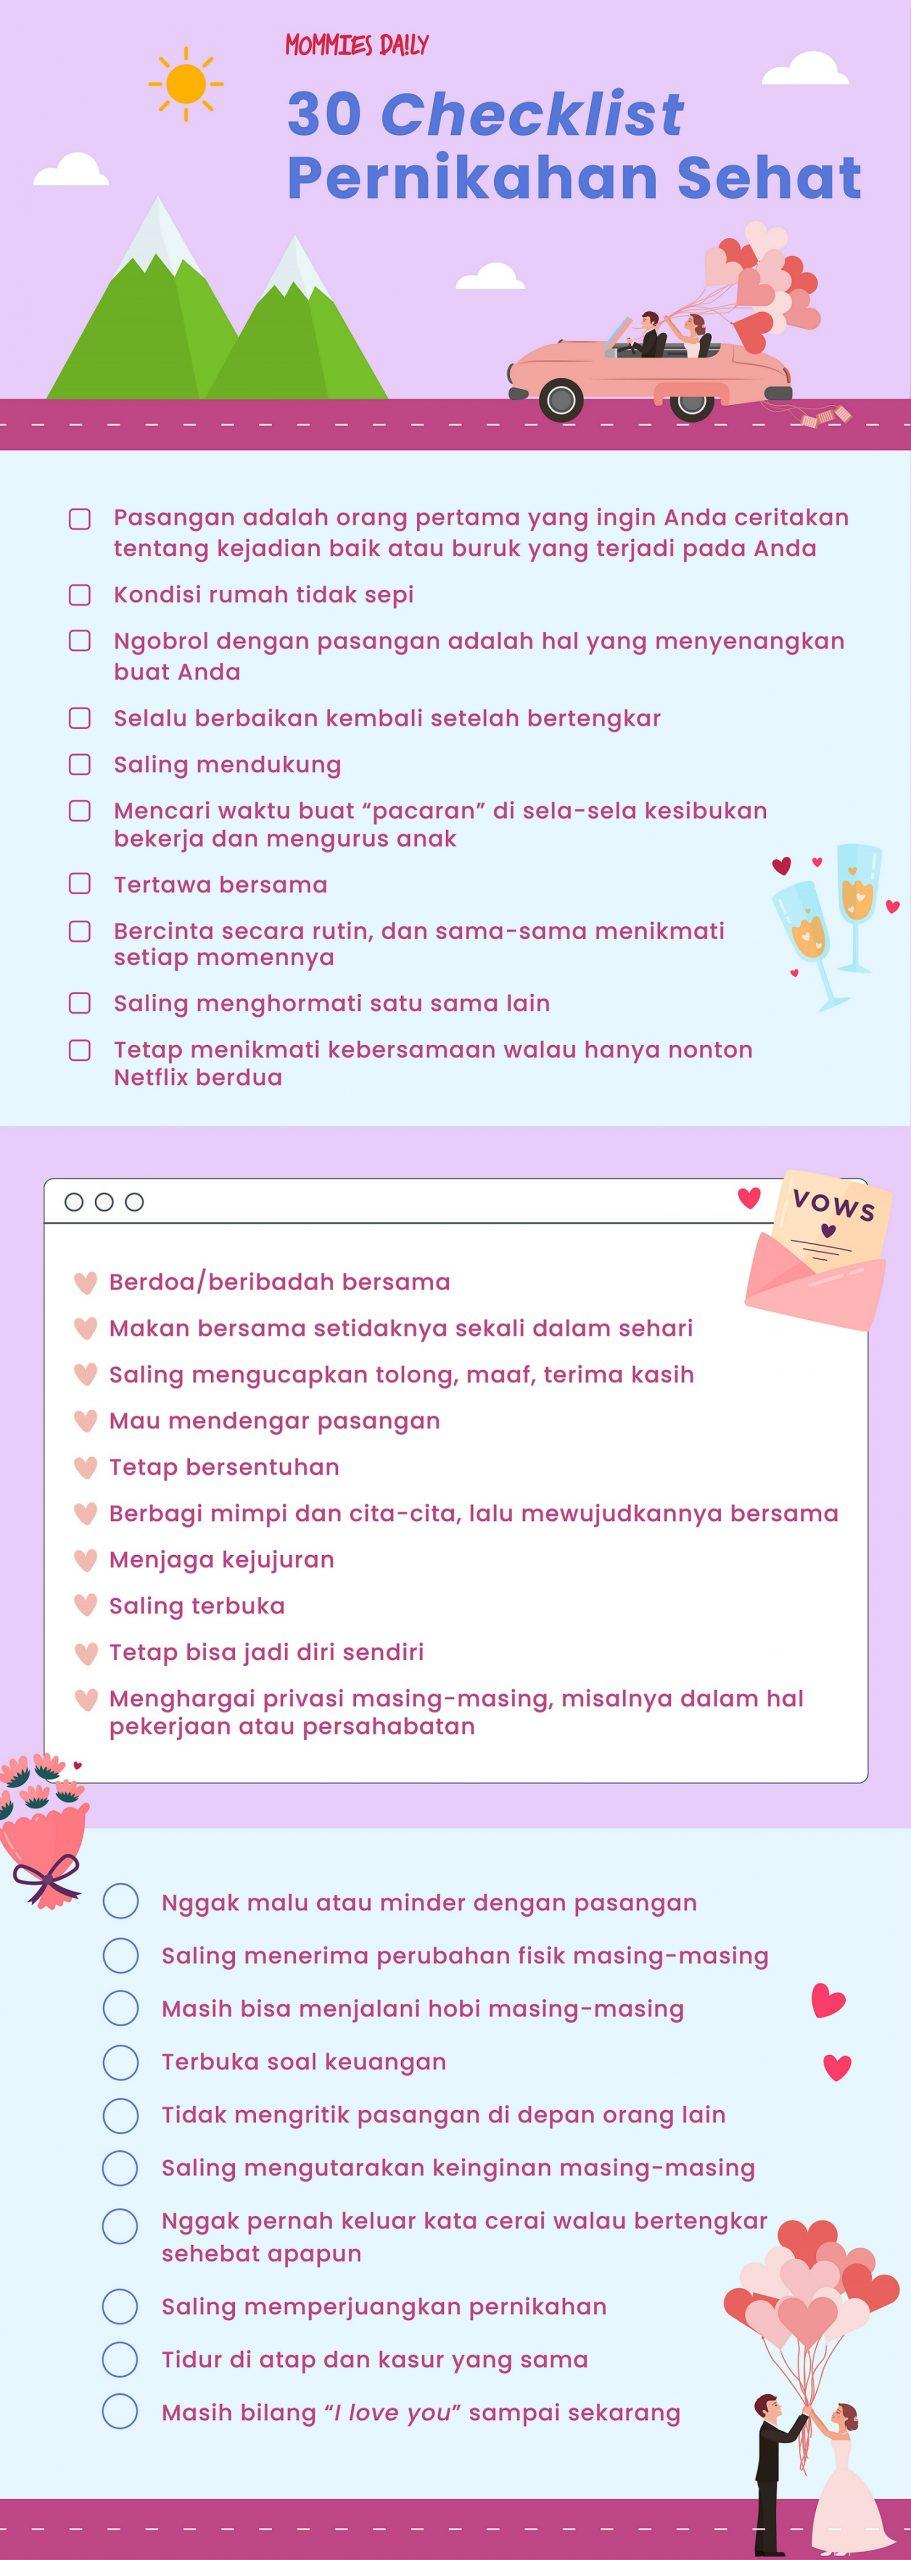 Checklist Perikahan Sehat